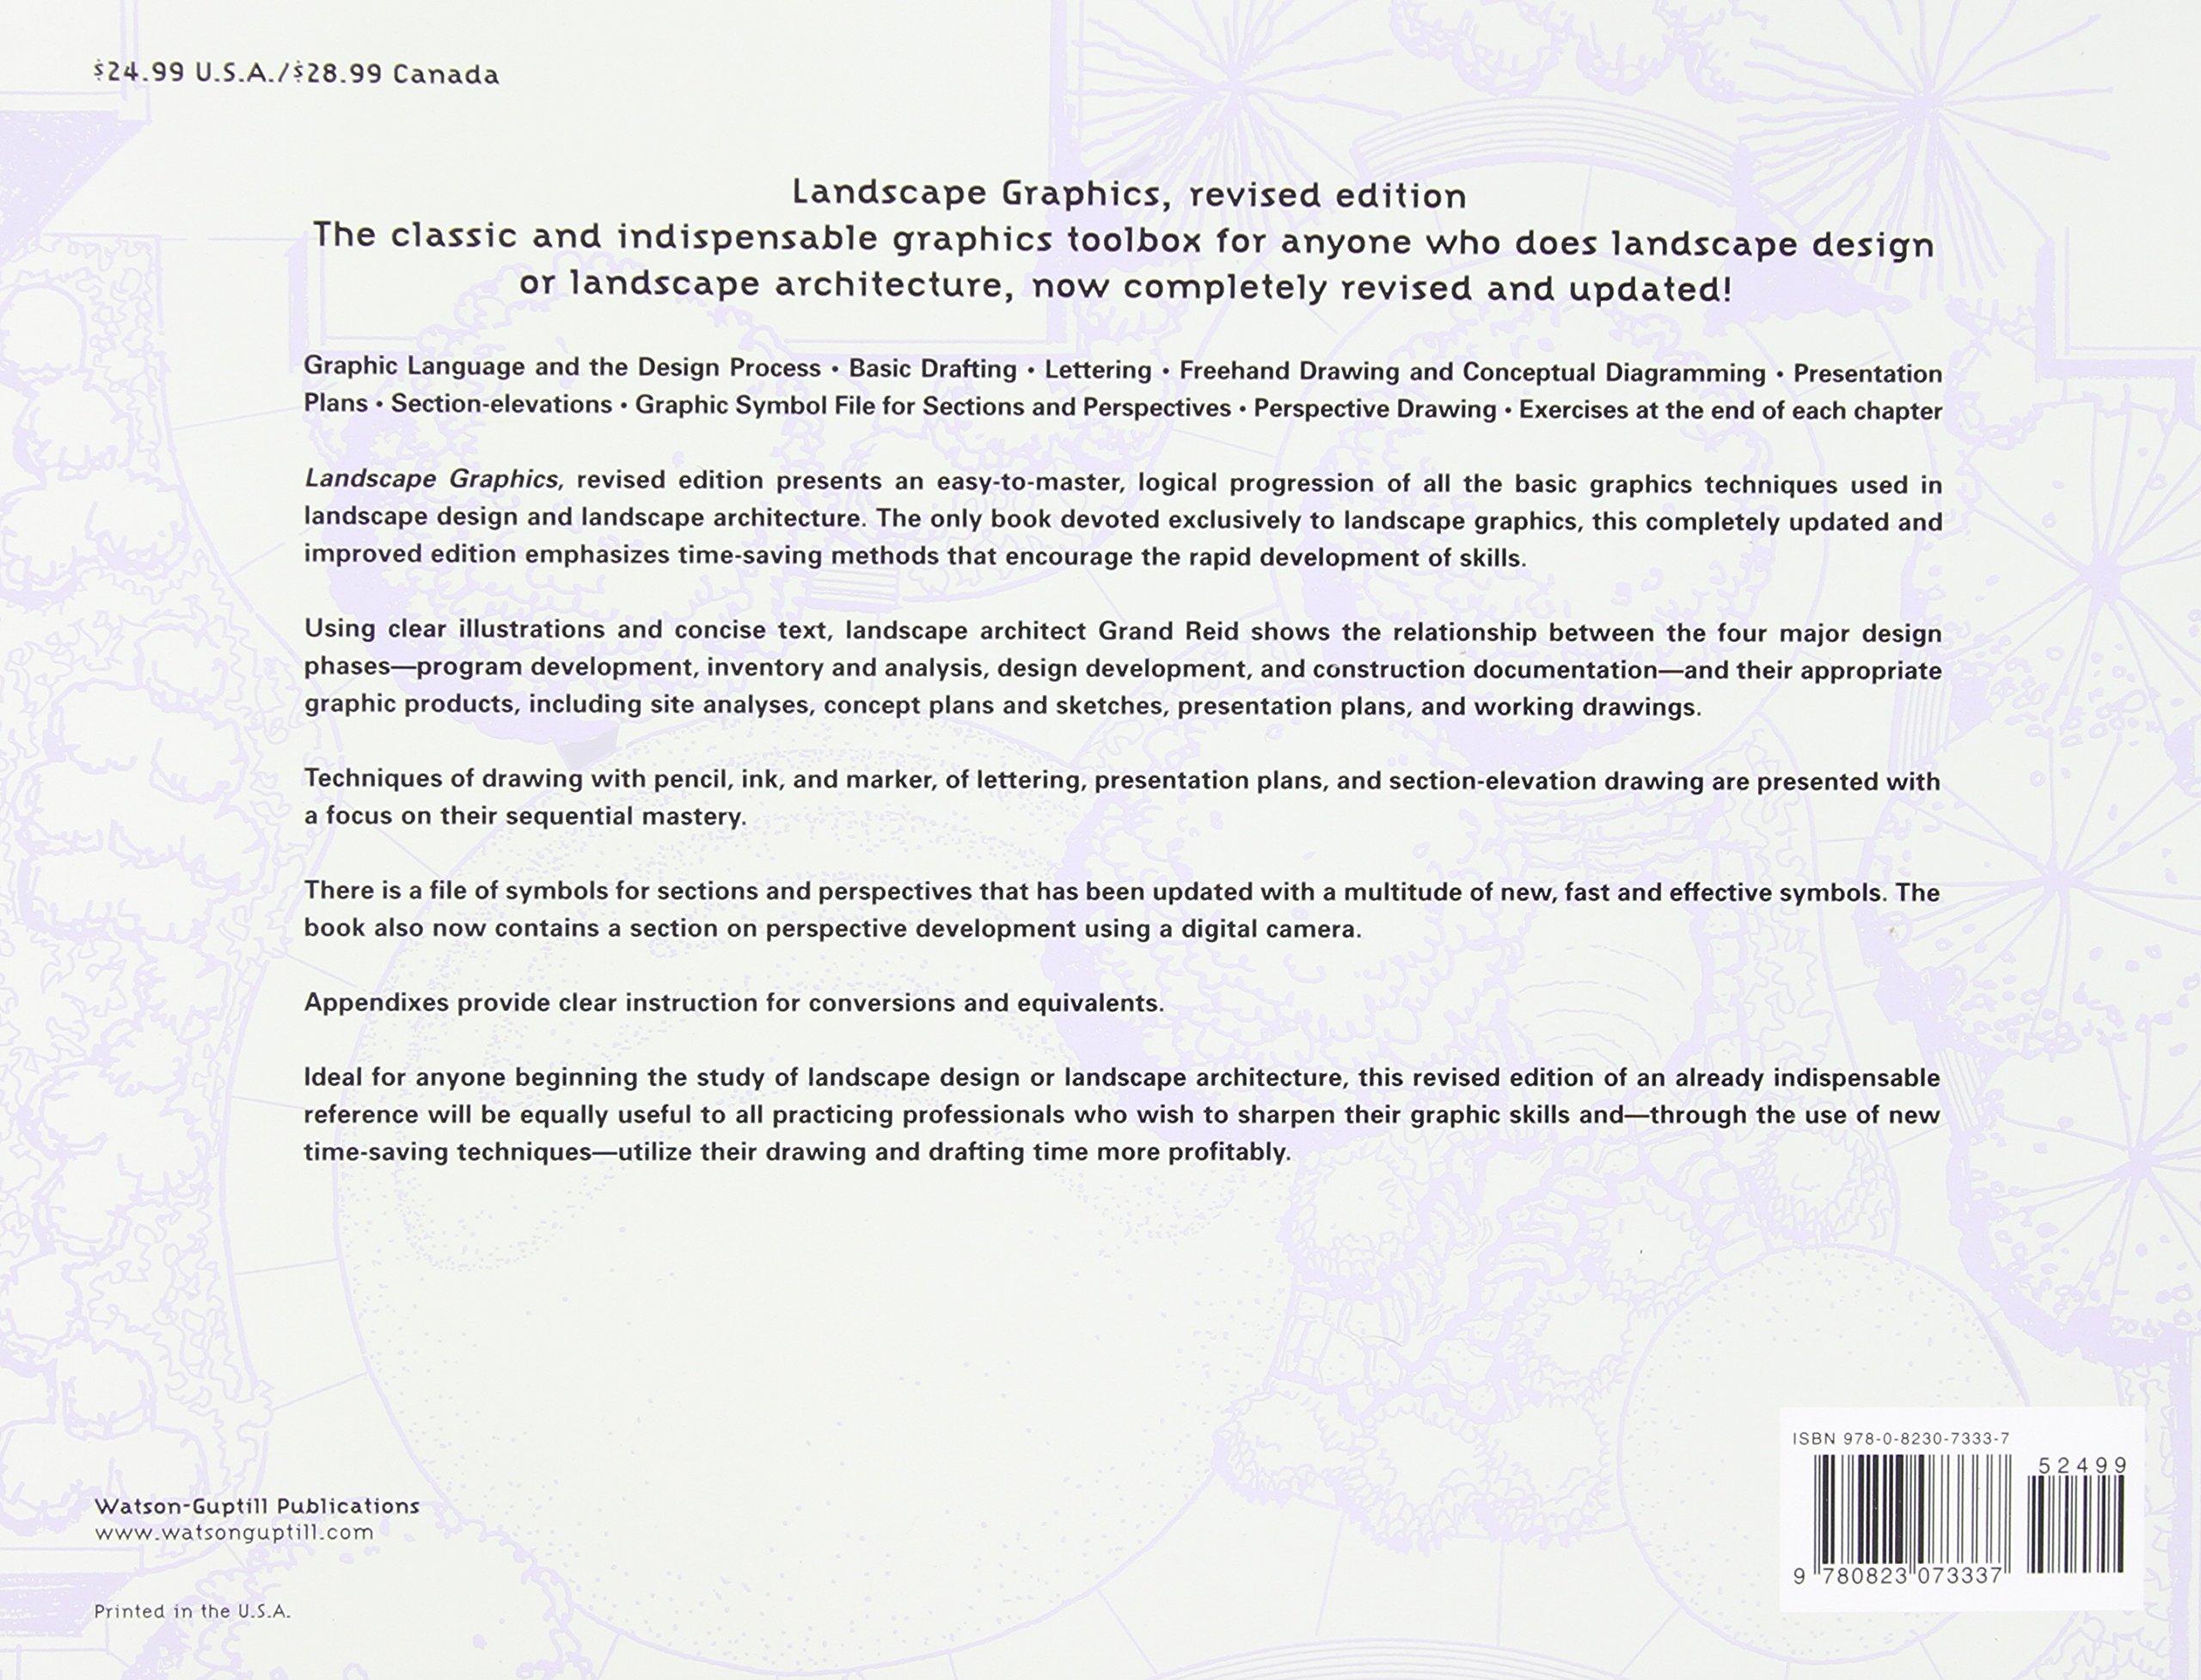 Elektroinstallation Symbols Pdf Files - loststrategic